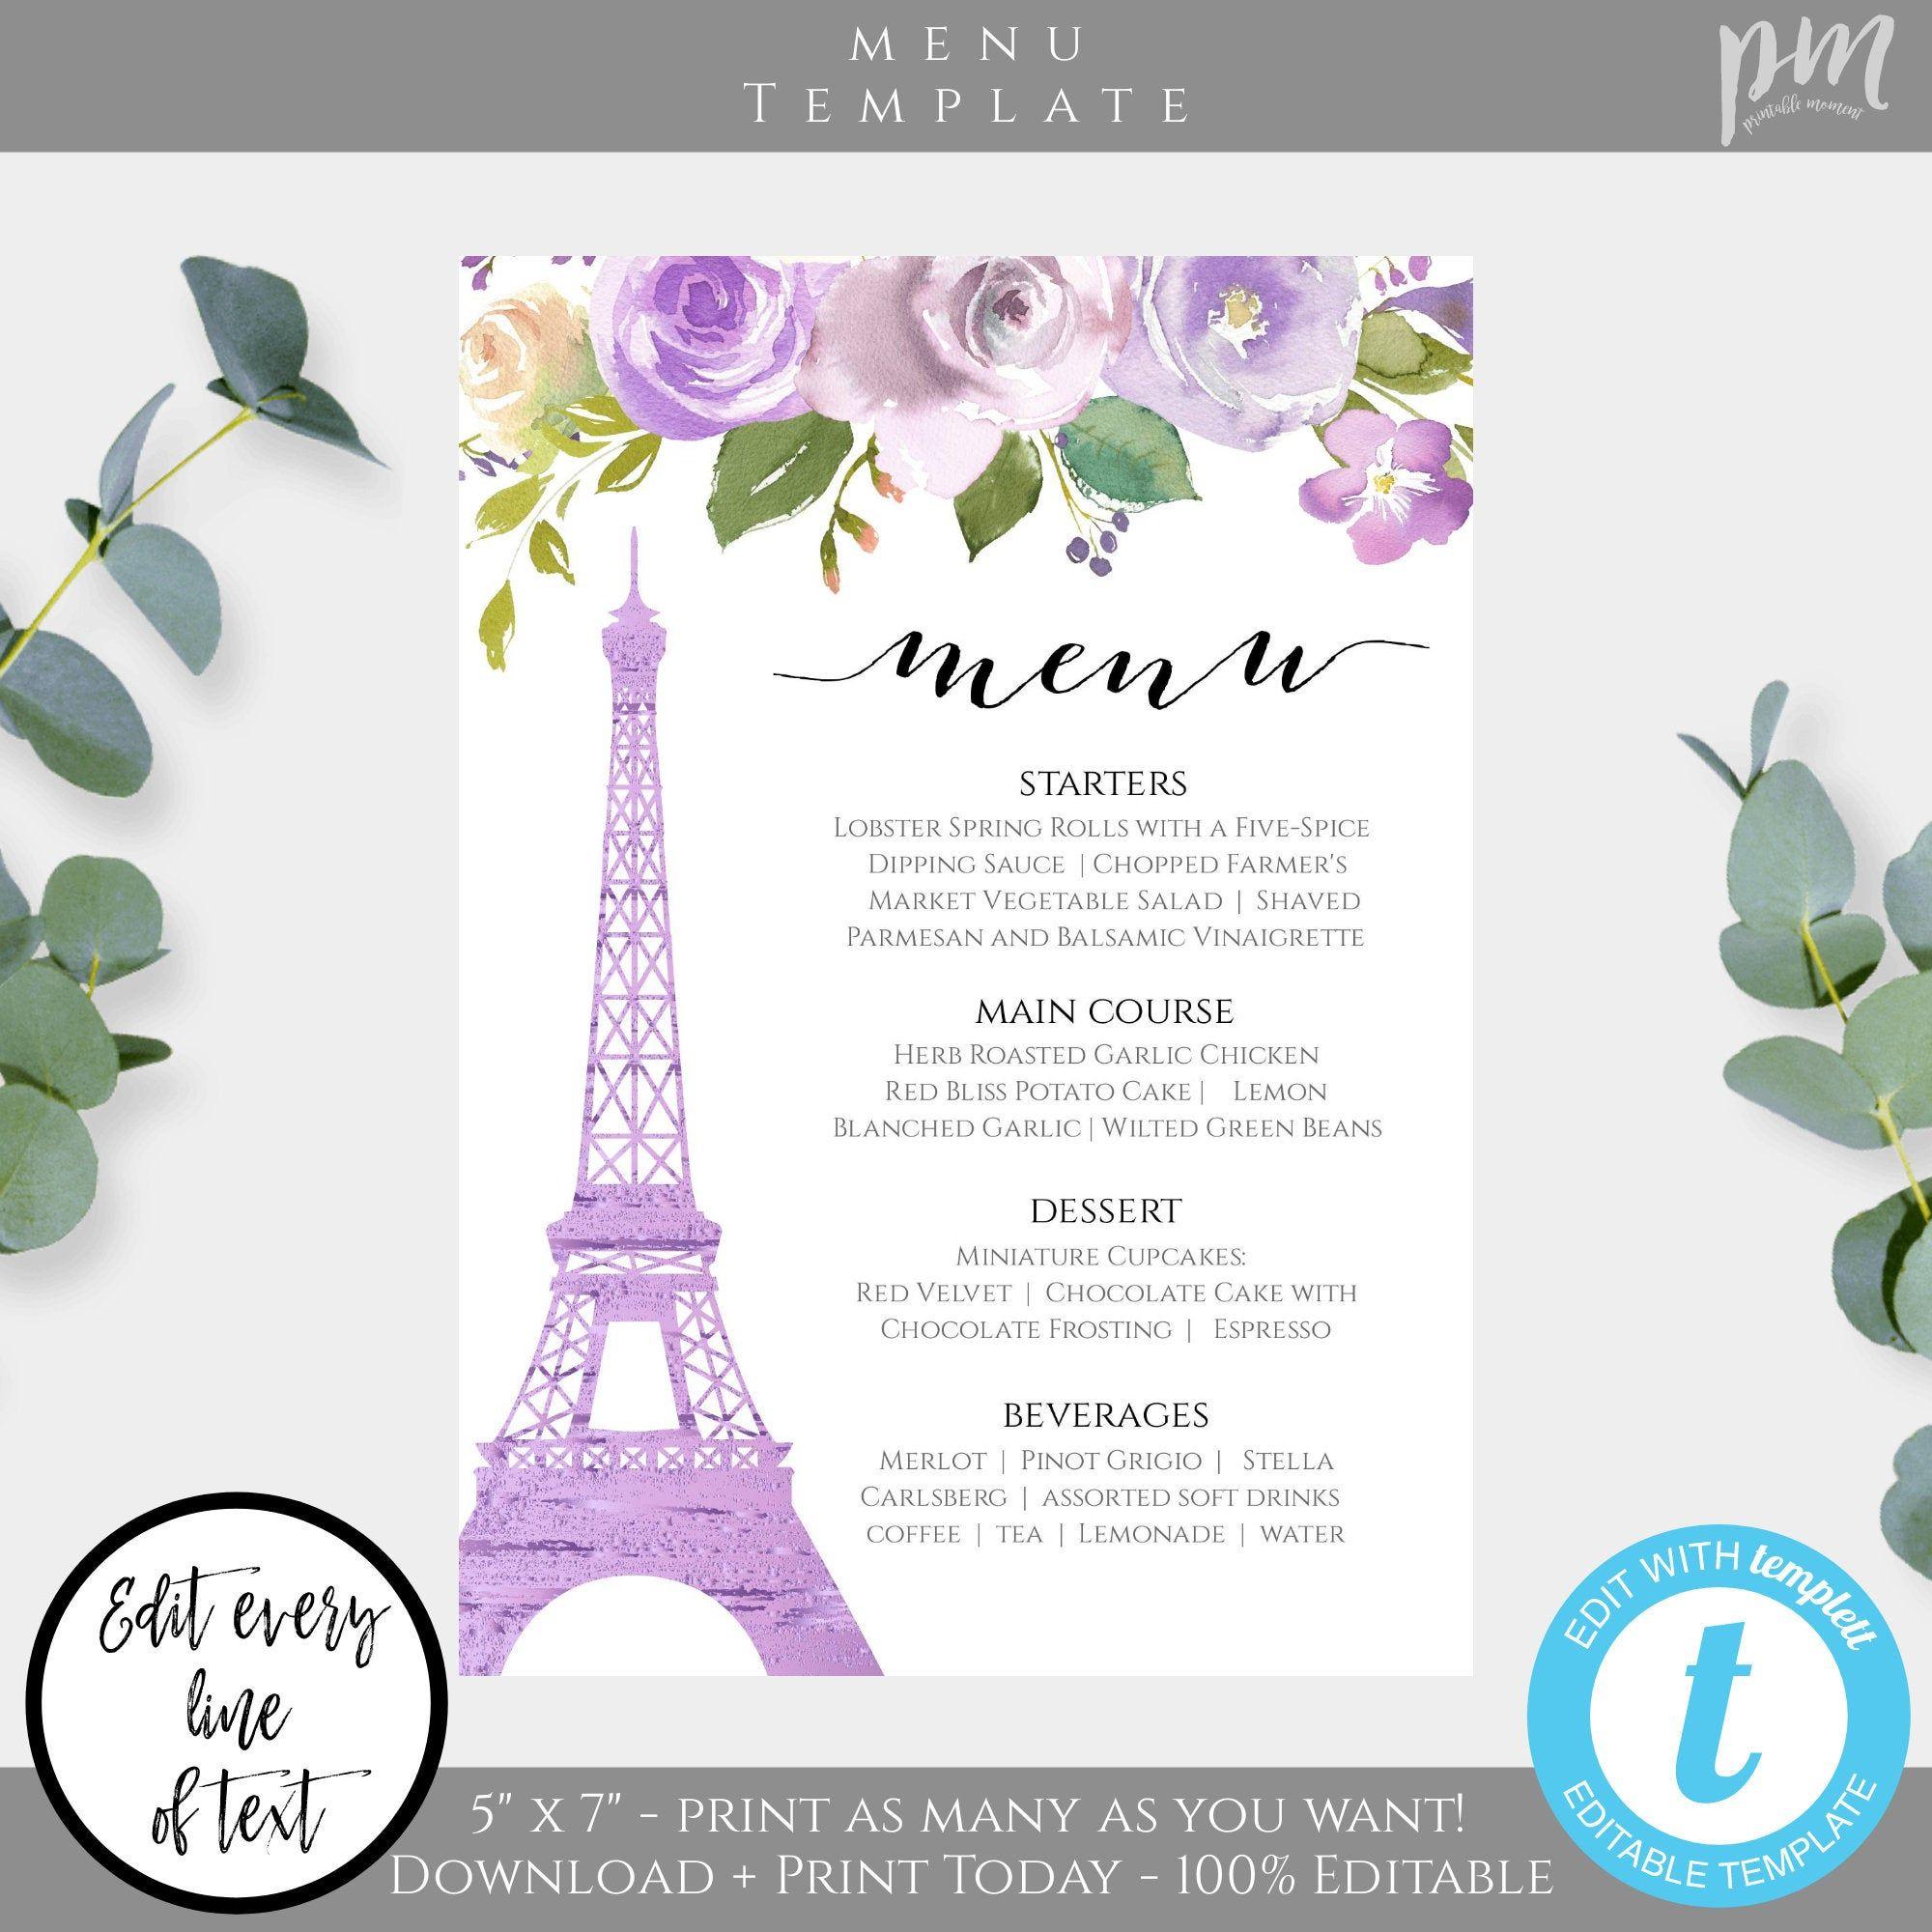 Drinks Party Menu Card Rustic Wedding Bar Menu Purple Flowers /& Gold Wedding Bar Menu Baby Shower Bridal Shower Printable Menu Template